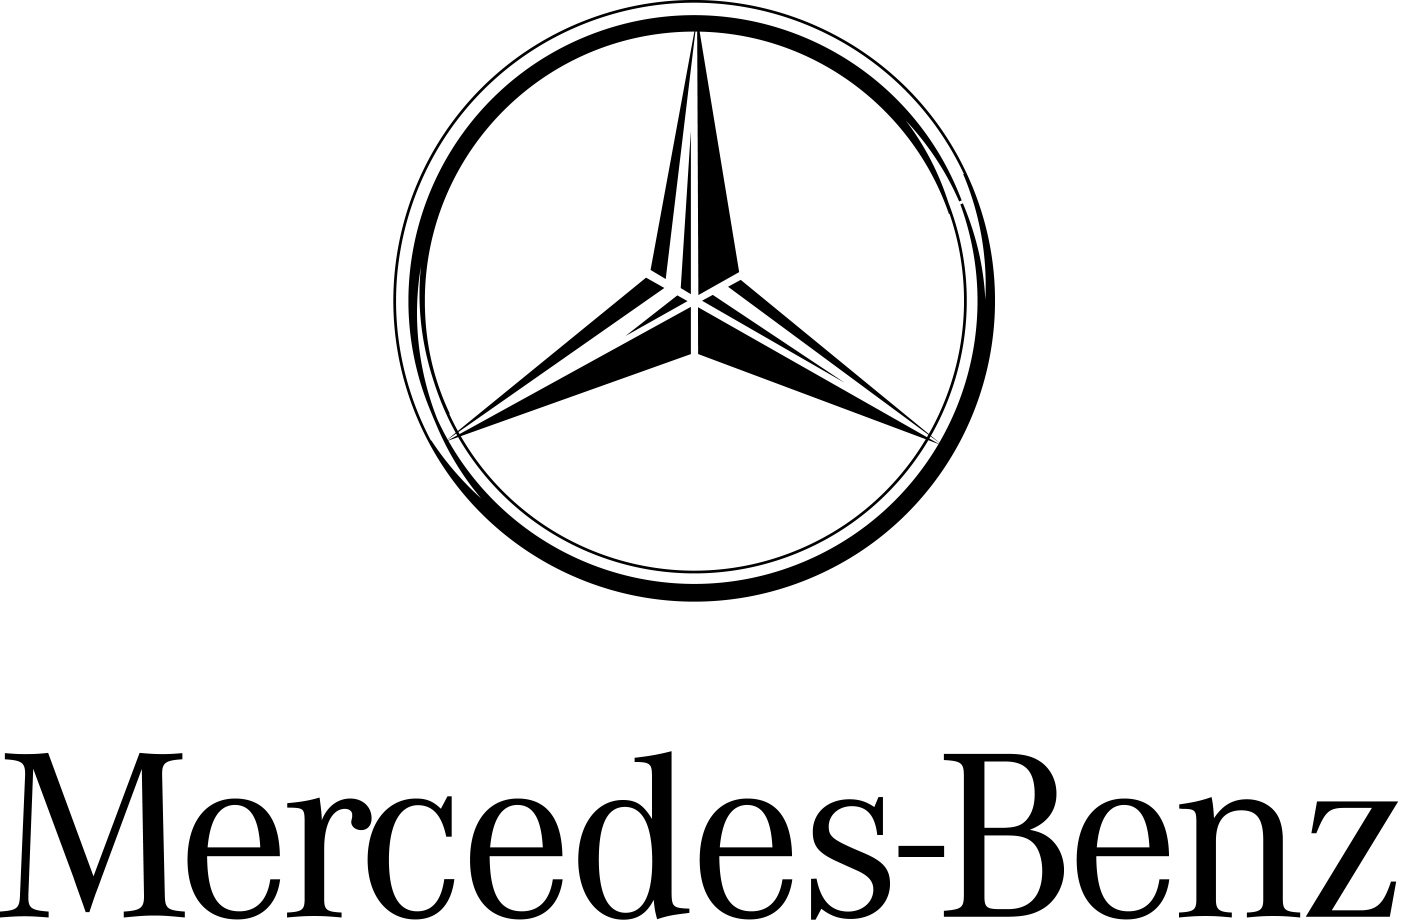 Mercedes-Benz : Brand Short Description Type Here.